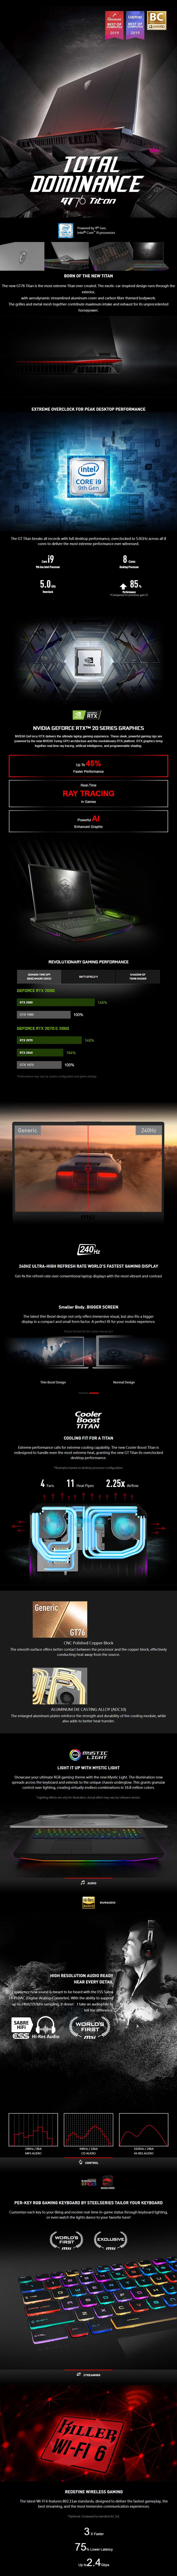 "MSI GT76 Titan DT 9SF 17.3"" 240Hz Gaming Laptop i9 32GB 1TB+1TB RTX2070 W10P - Overview 1"